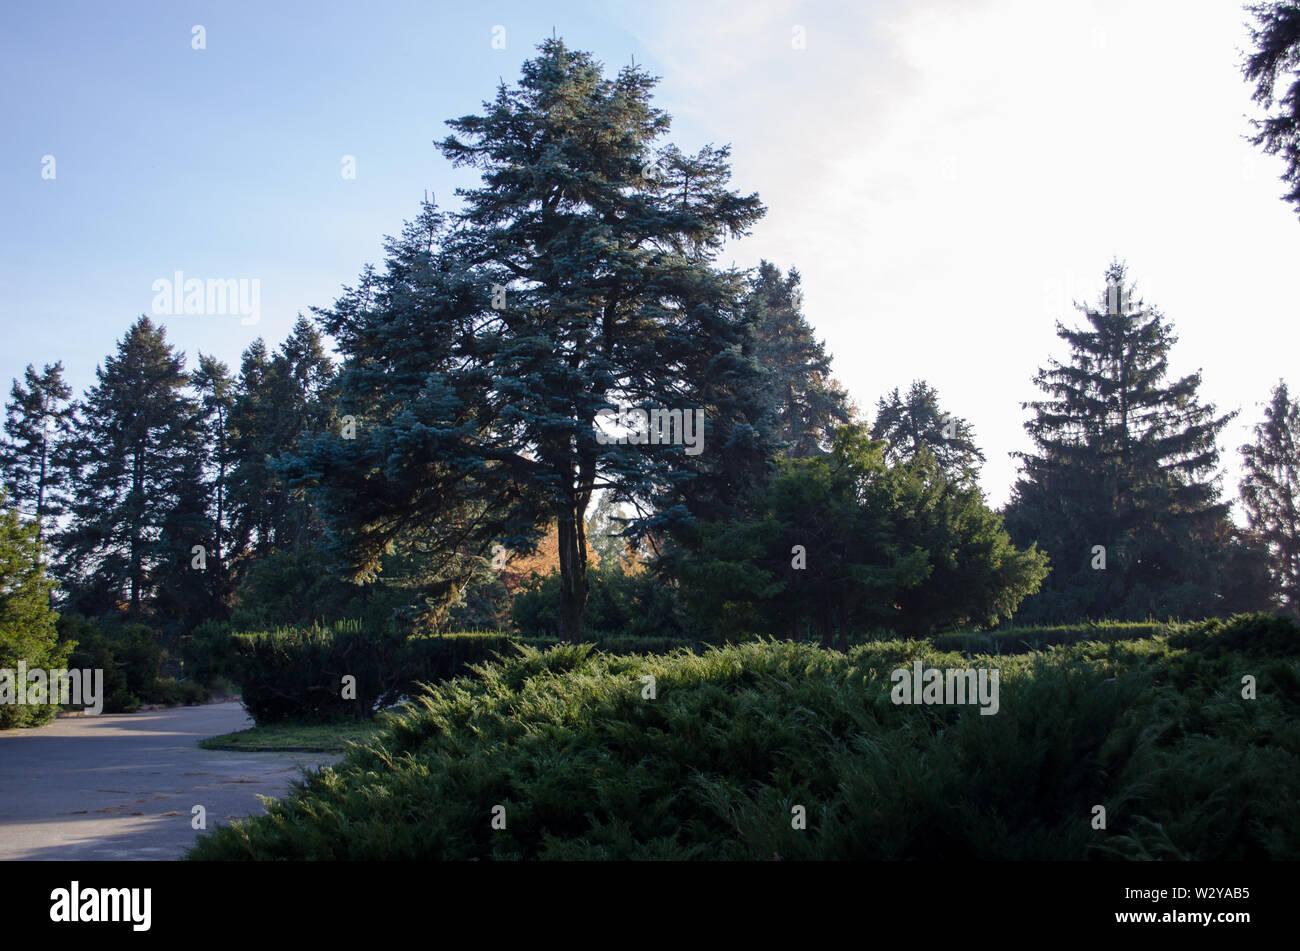 Beautiful conifers in the botanical garden. Coniferous kingdom. - Stock Image